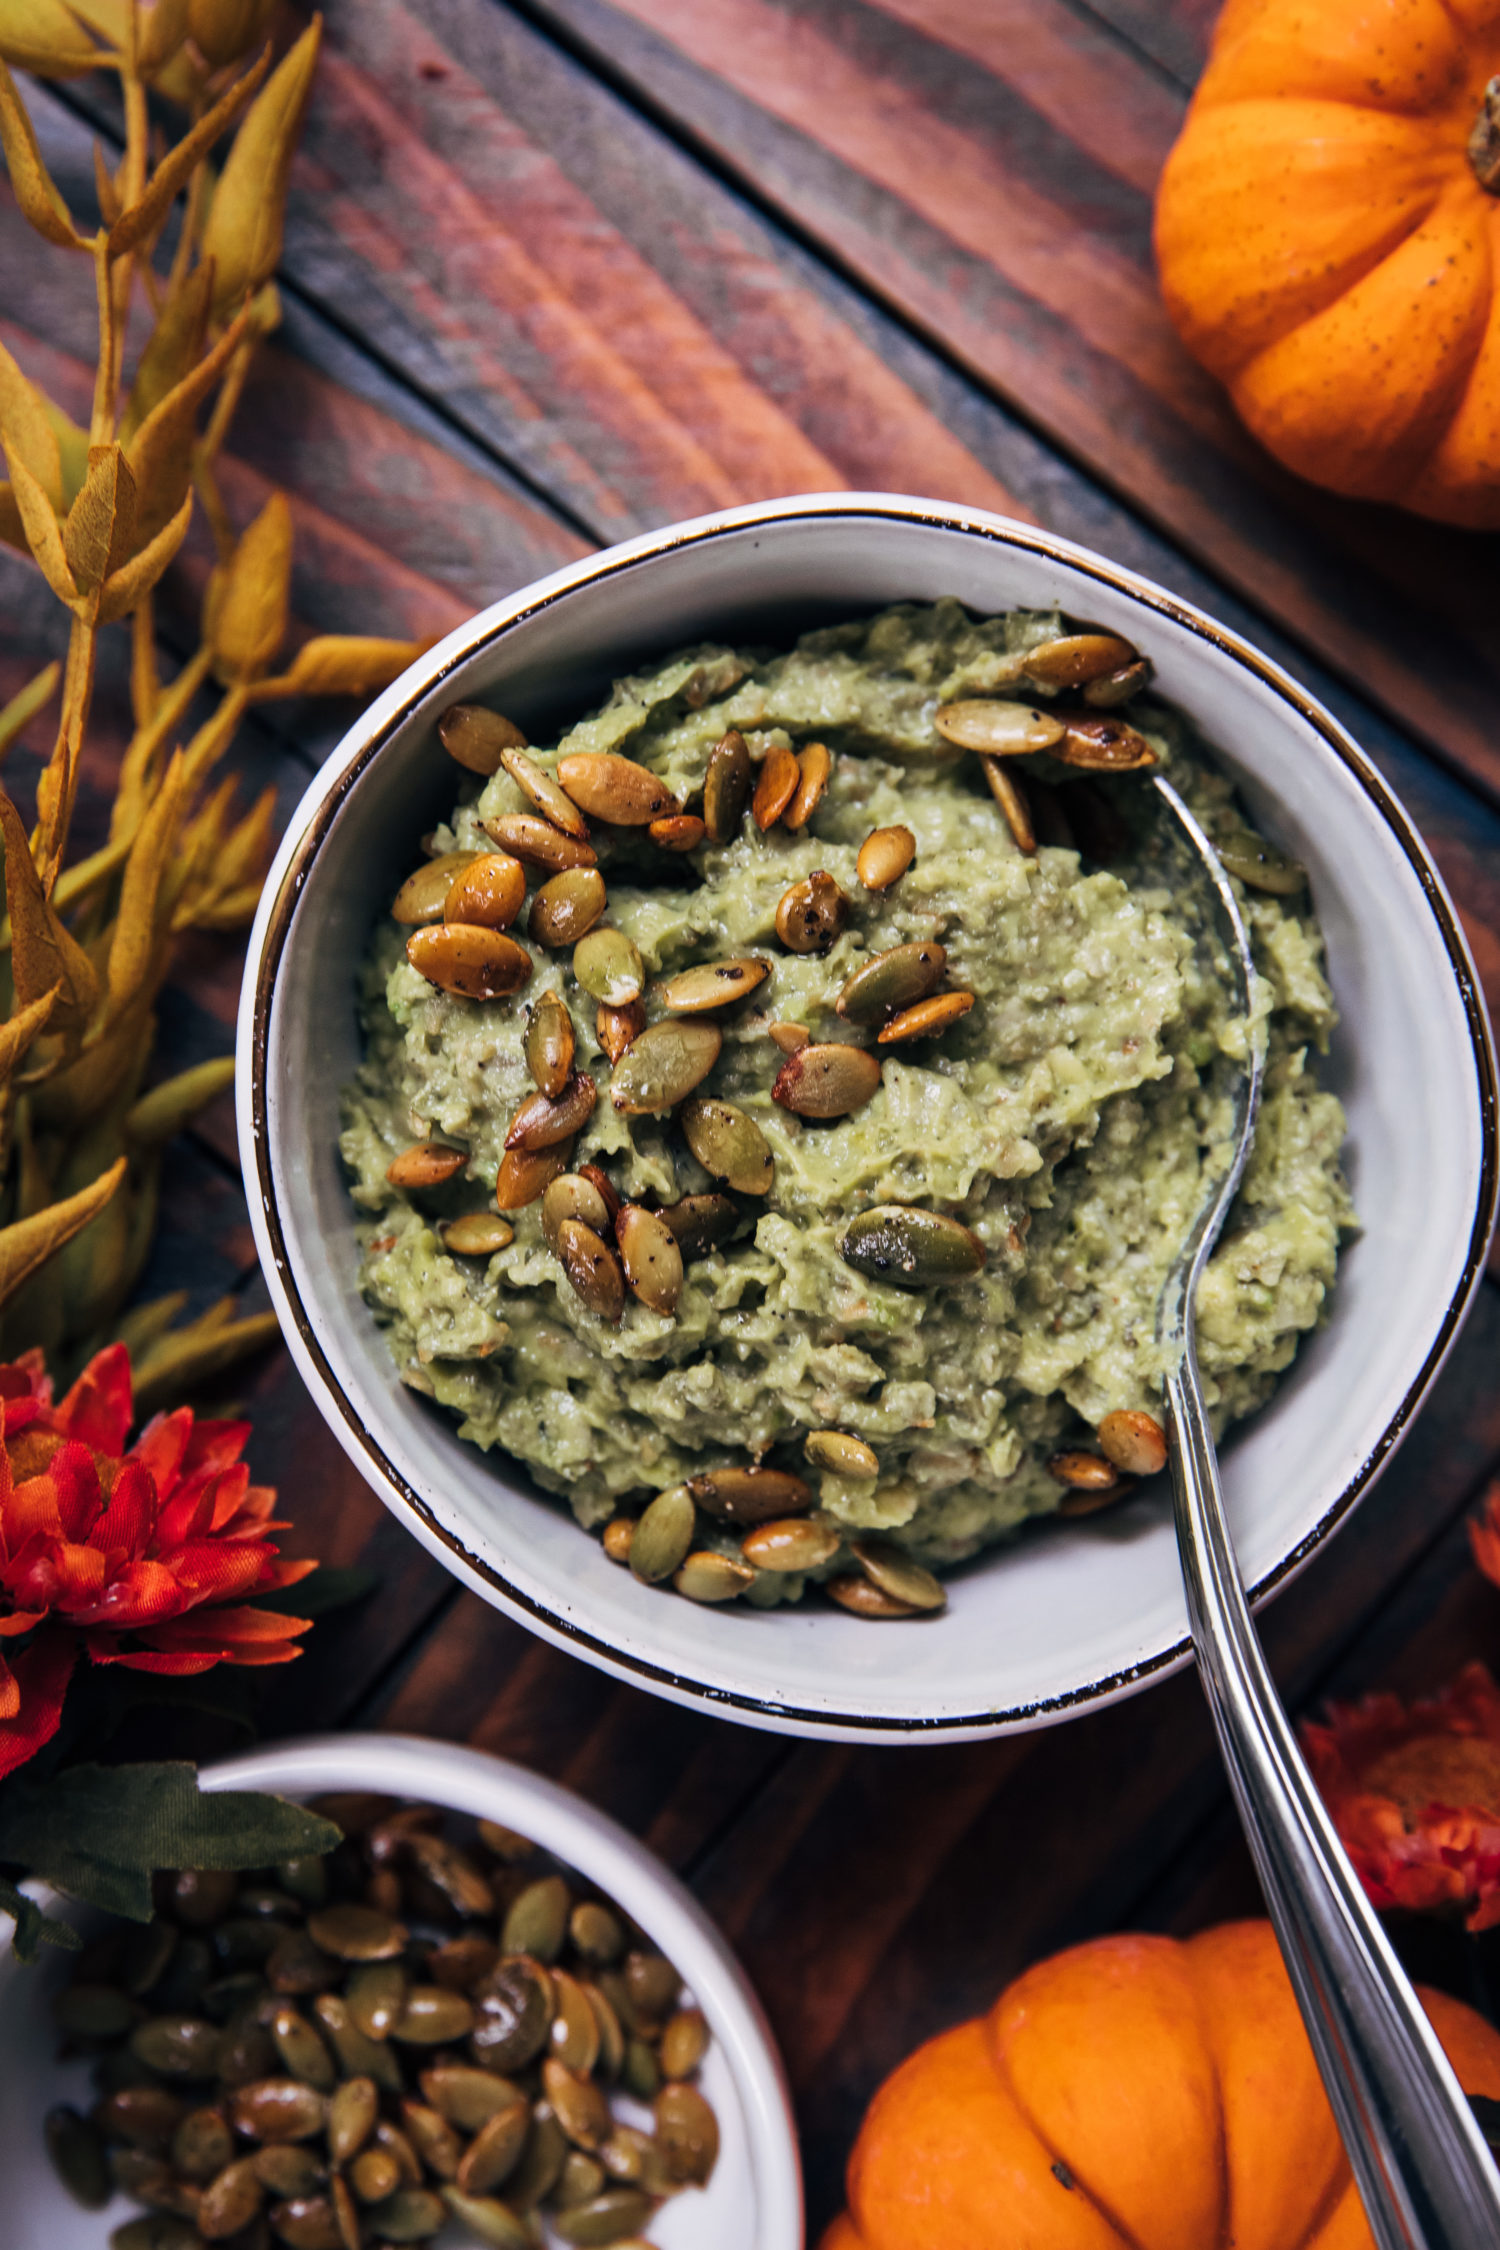 Pumpkin Seed Avocado Dip | Well and Full | #vegan #fall #autumn #recipe